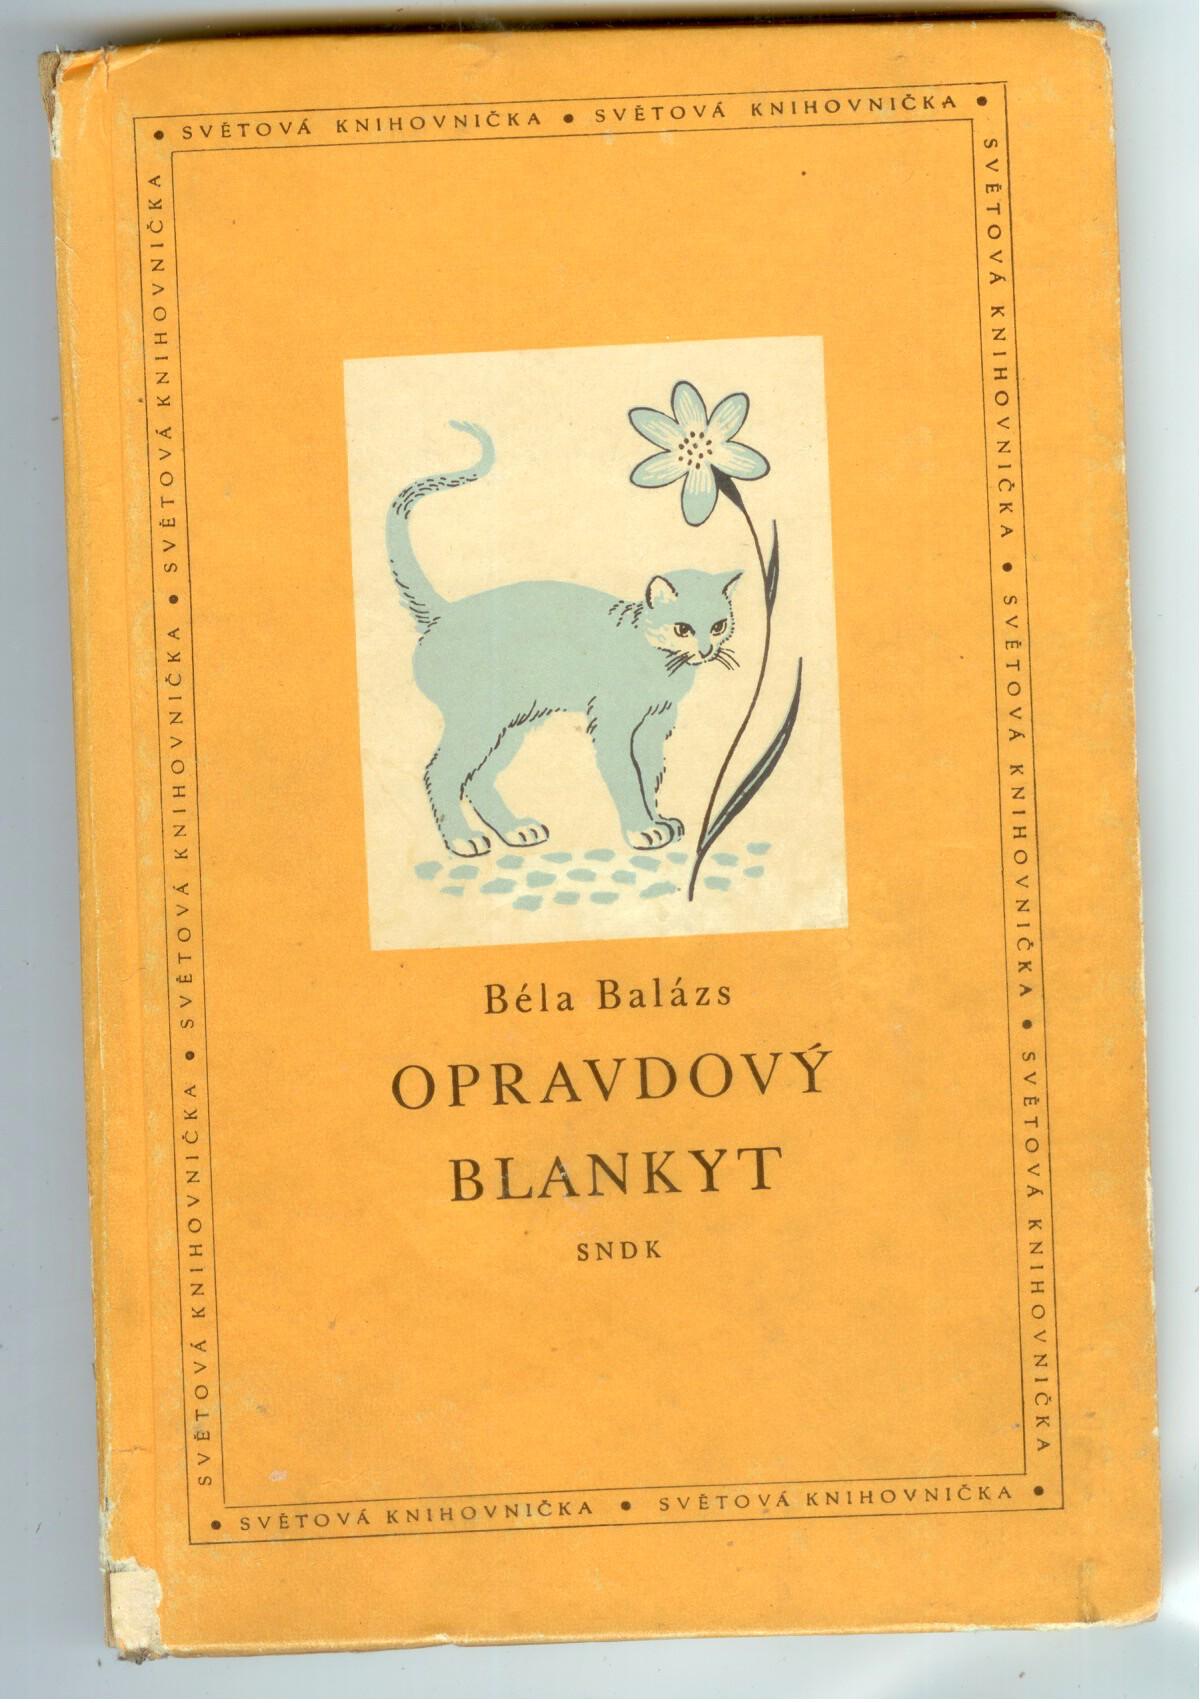 Opravdový blankyt - Béla Balázs